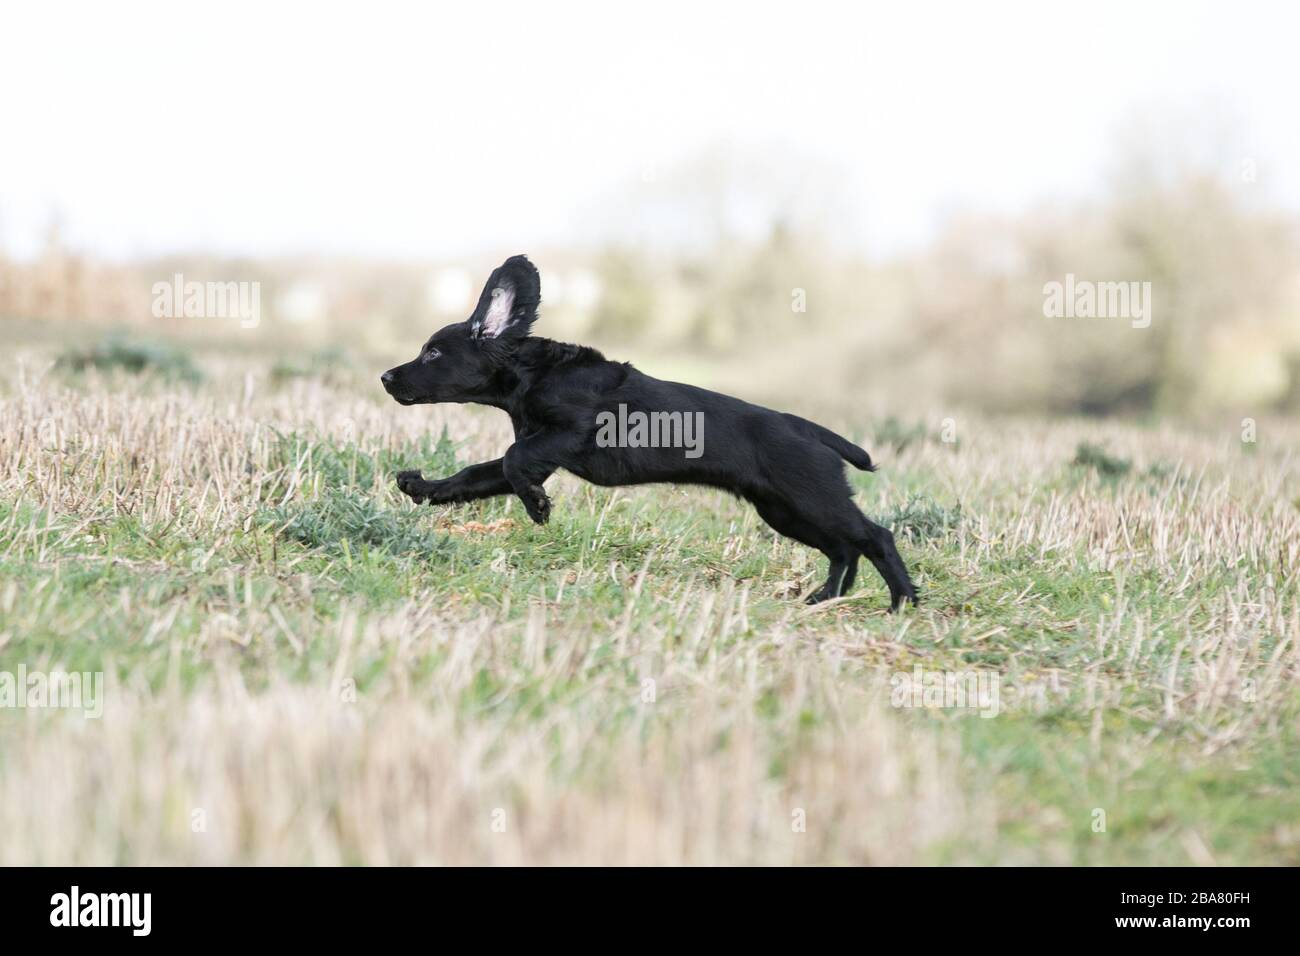 Negro trabajador cachorro spaniel Foto de stock